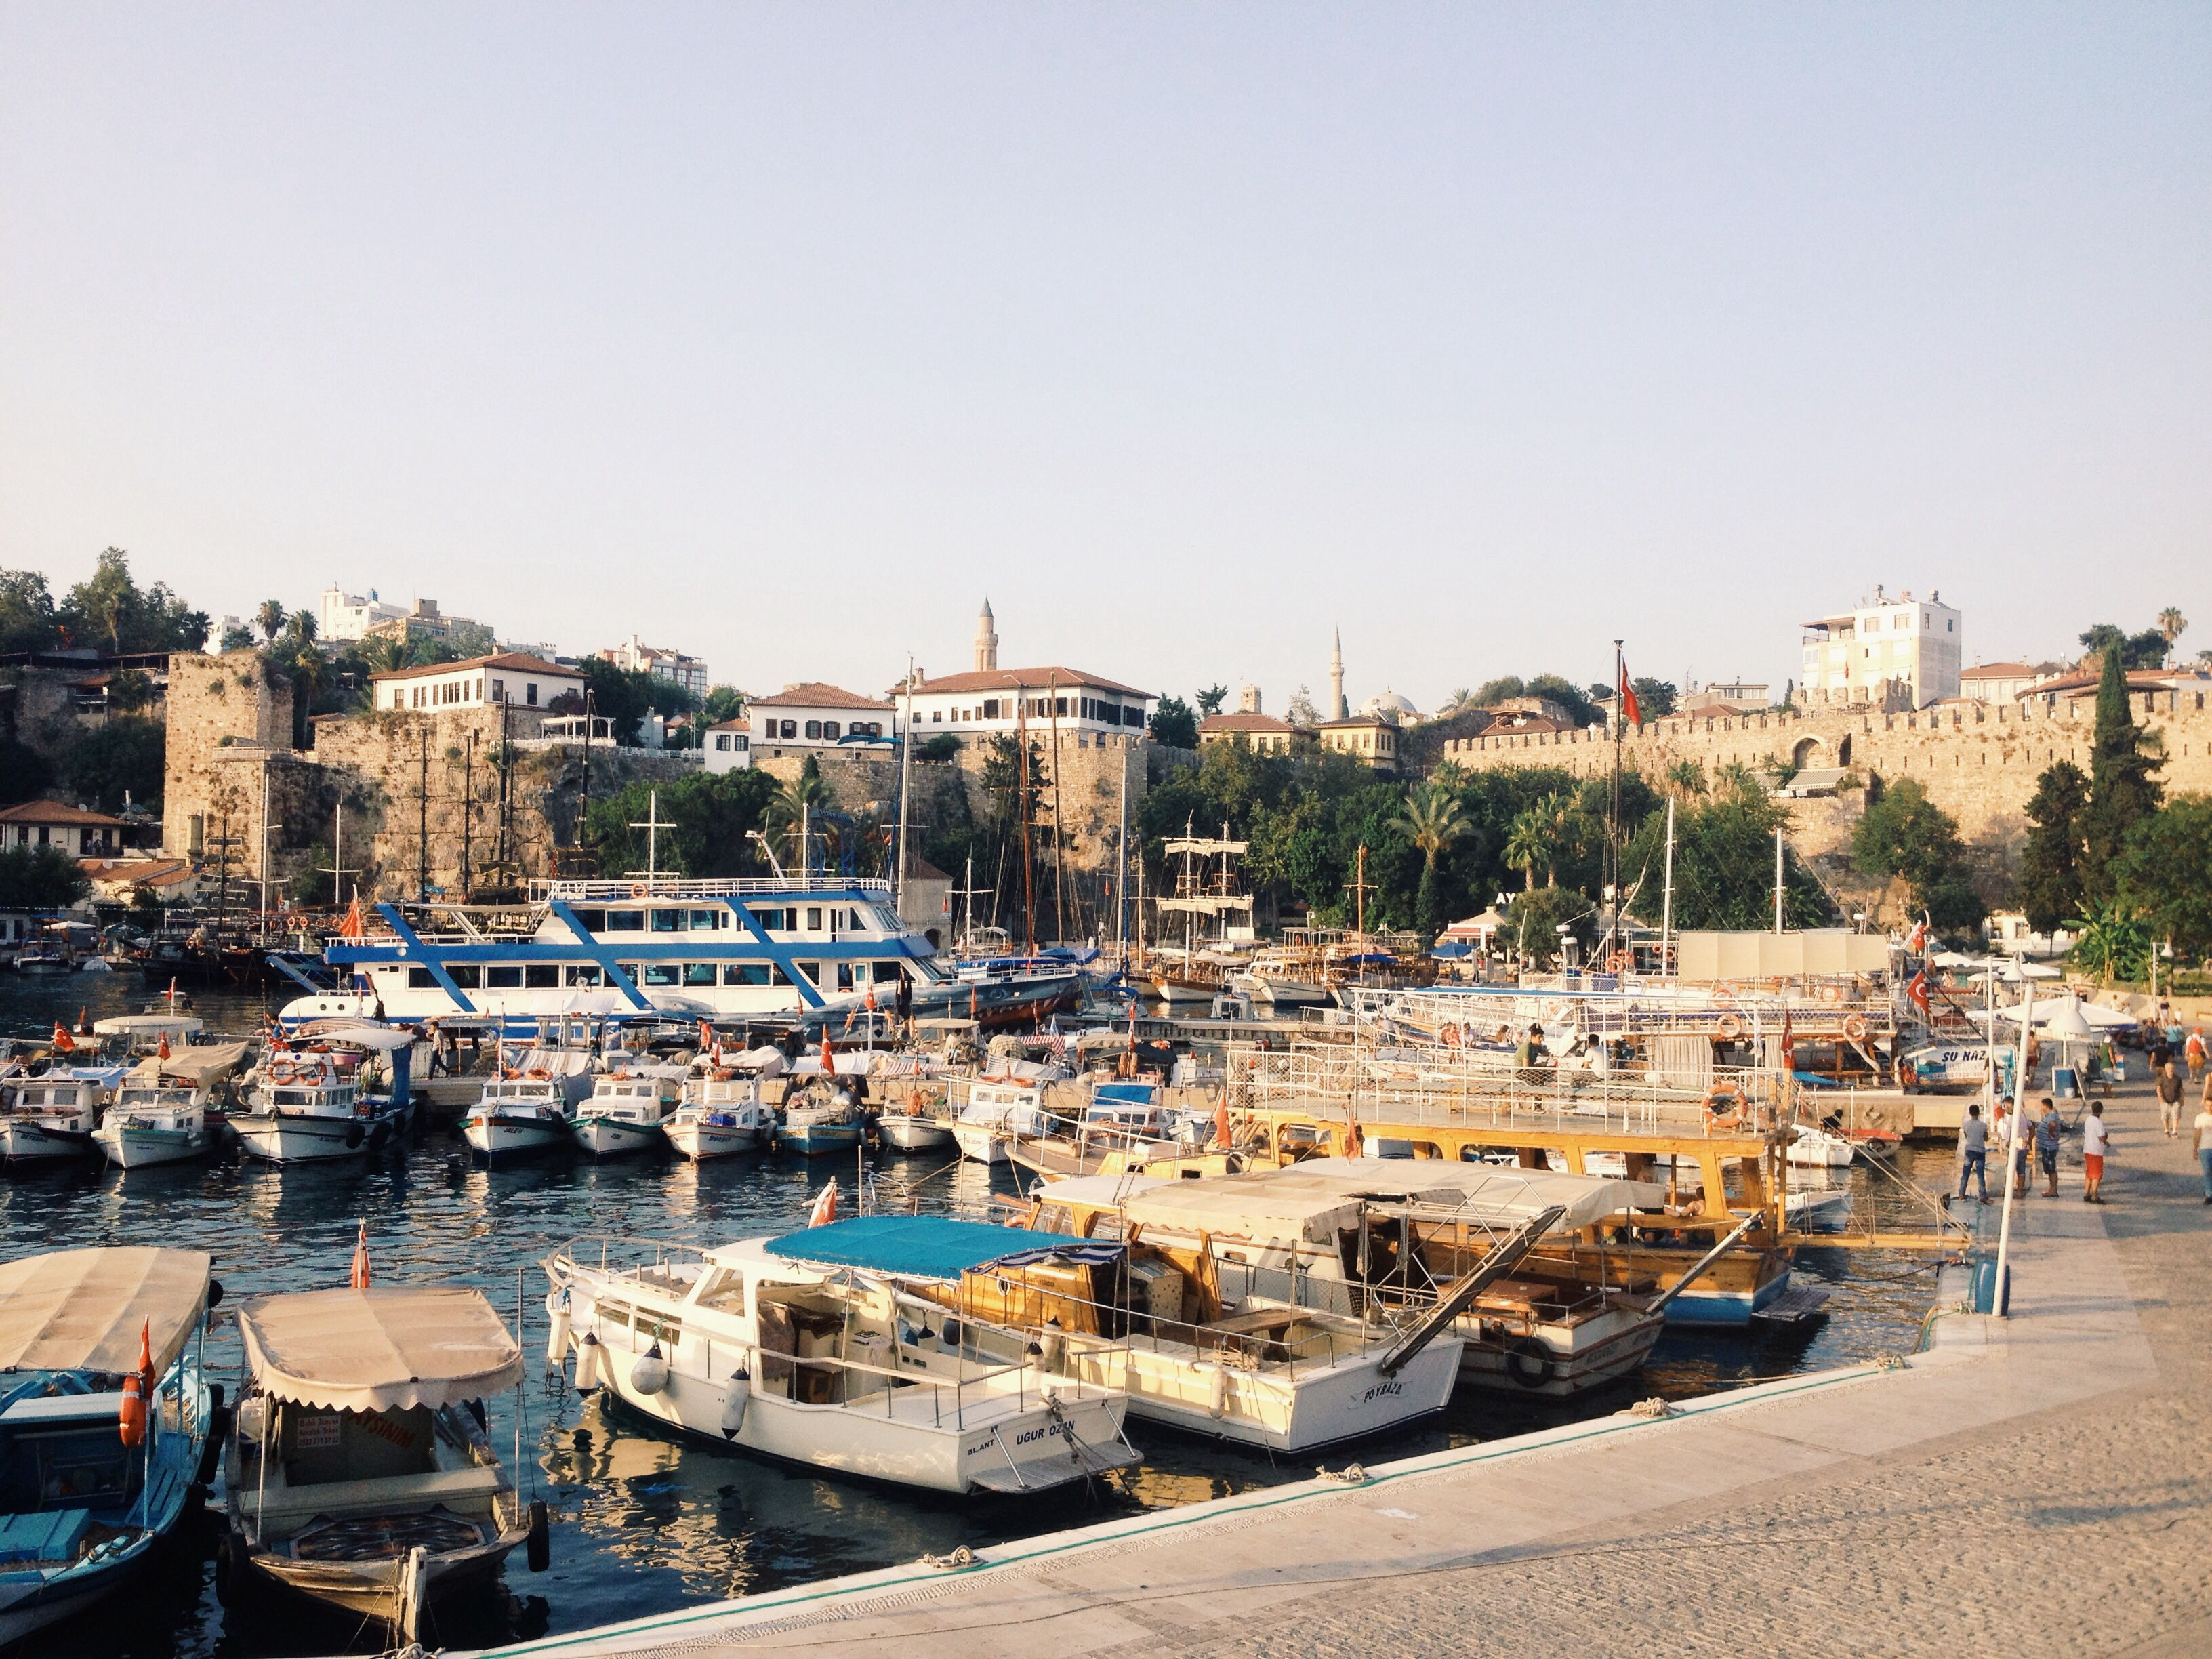 Antalya, Turkey  Photograph: Dina Basarab